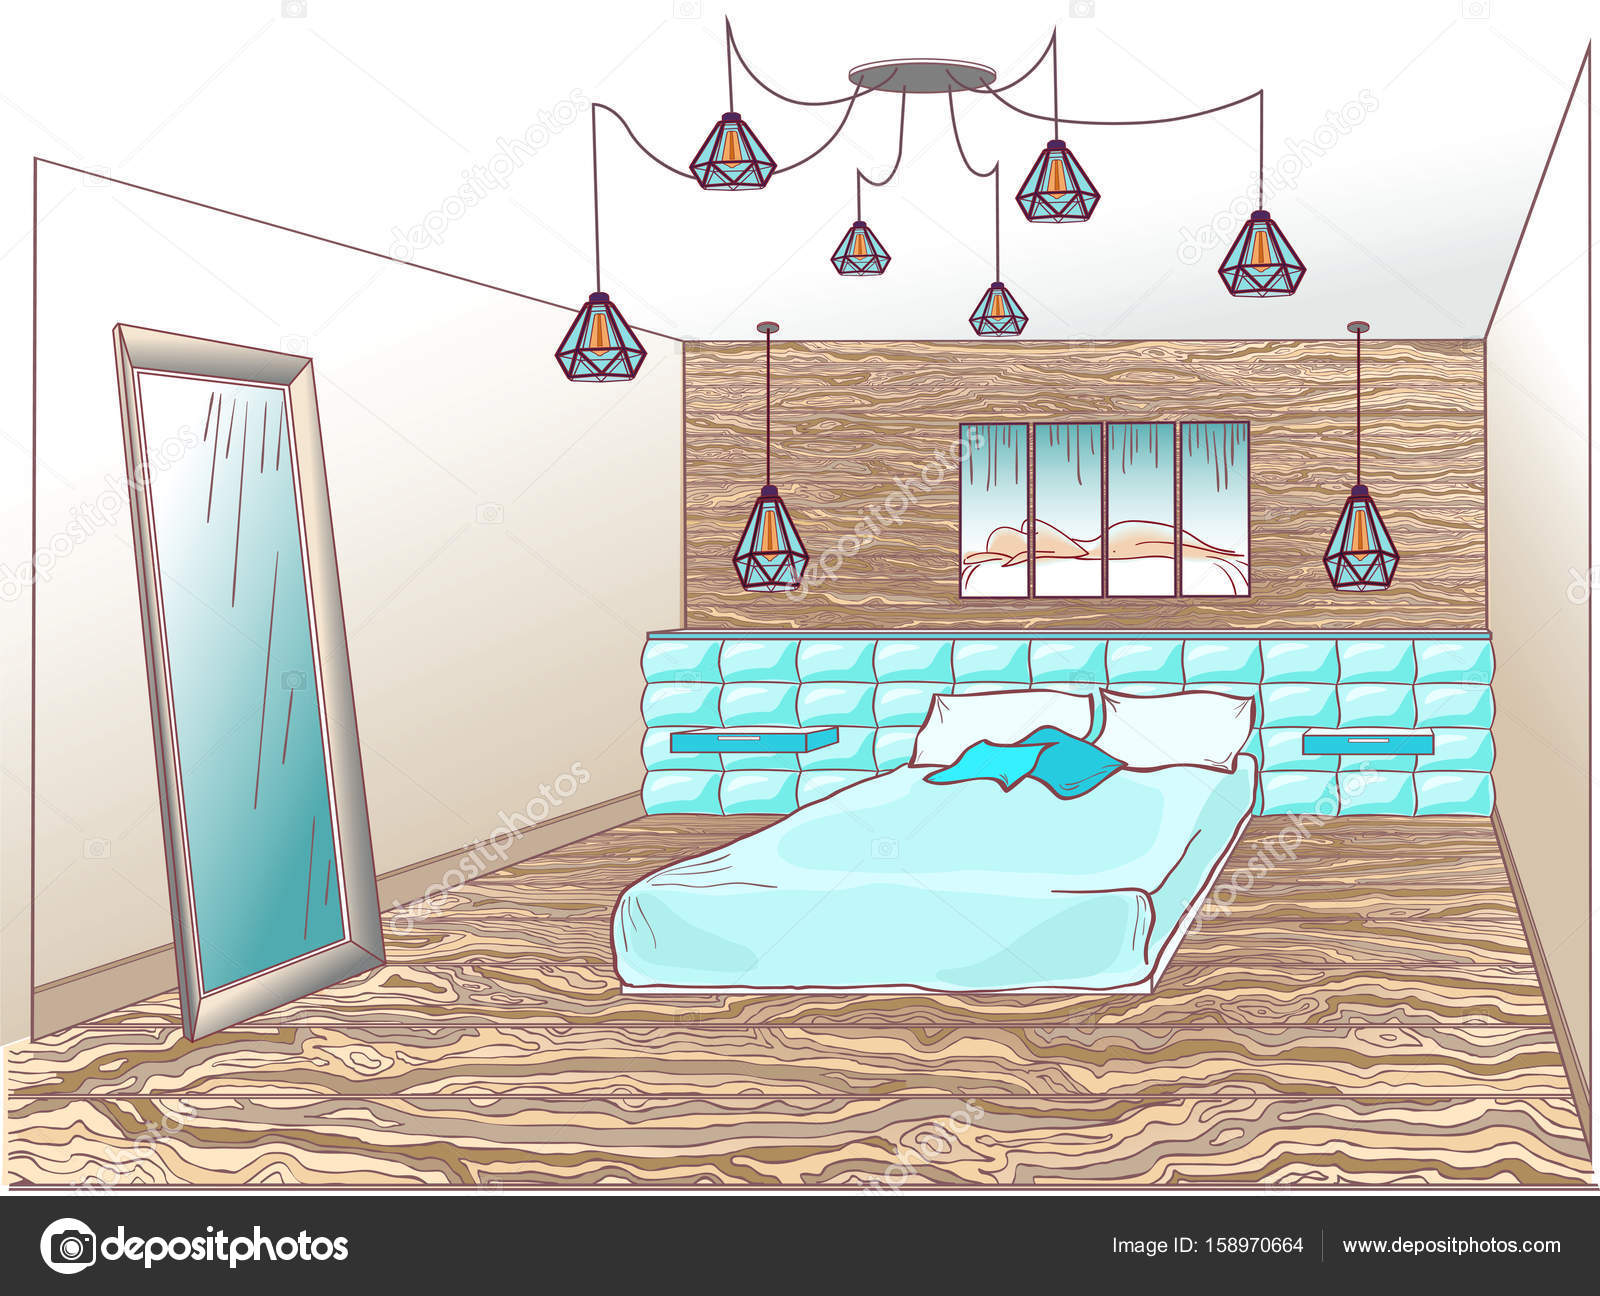 https://st3.depositphotos.com/10365226/15897/v/1600/depositphotos_158970664-stockillustratie-loft-slaapkamer-blauw.jpg